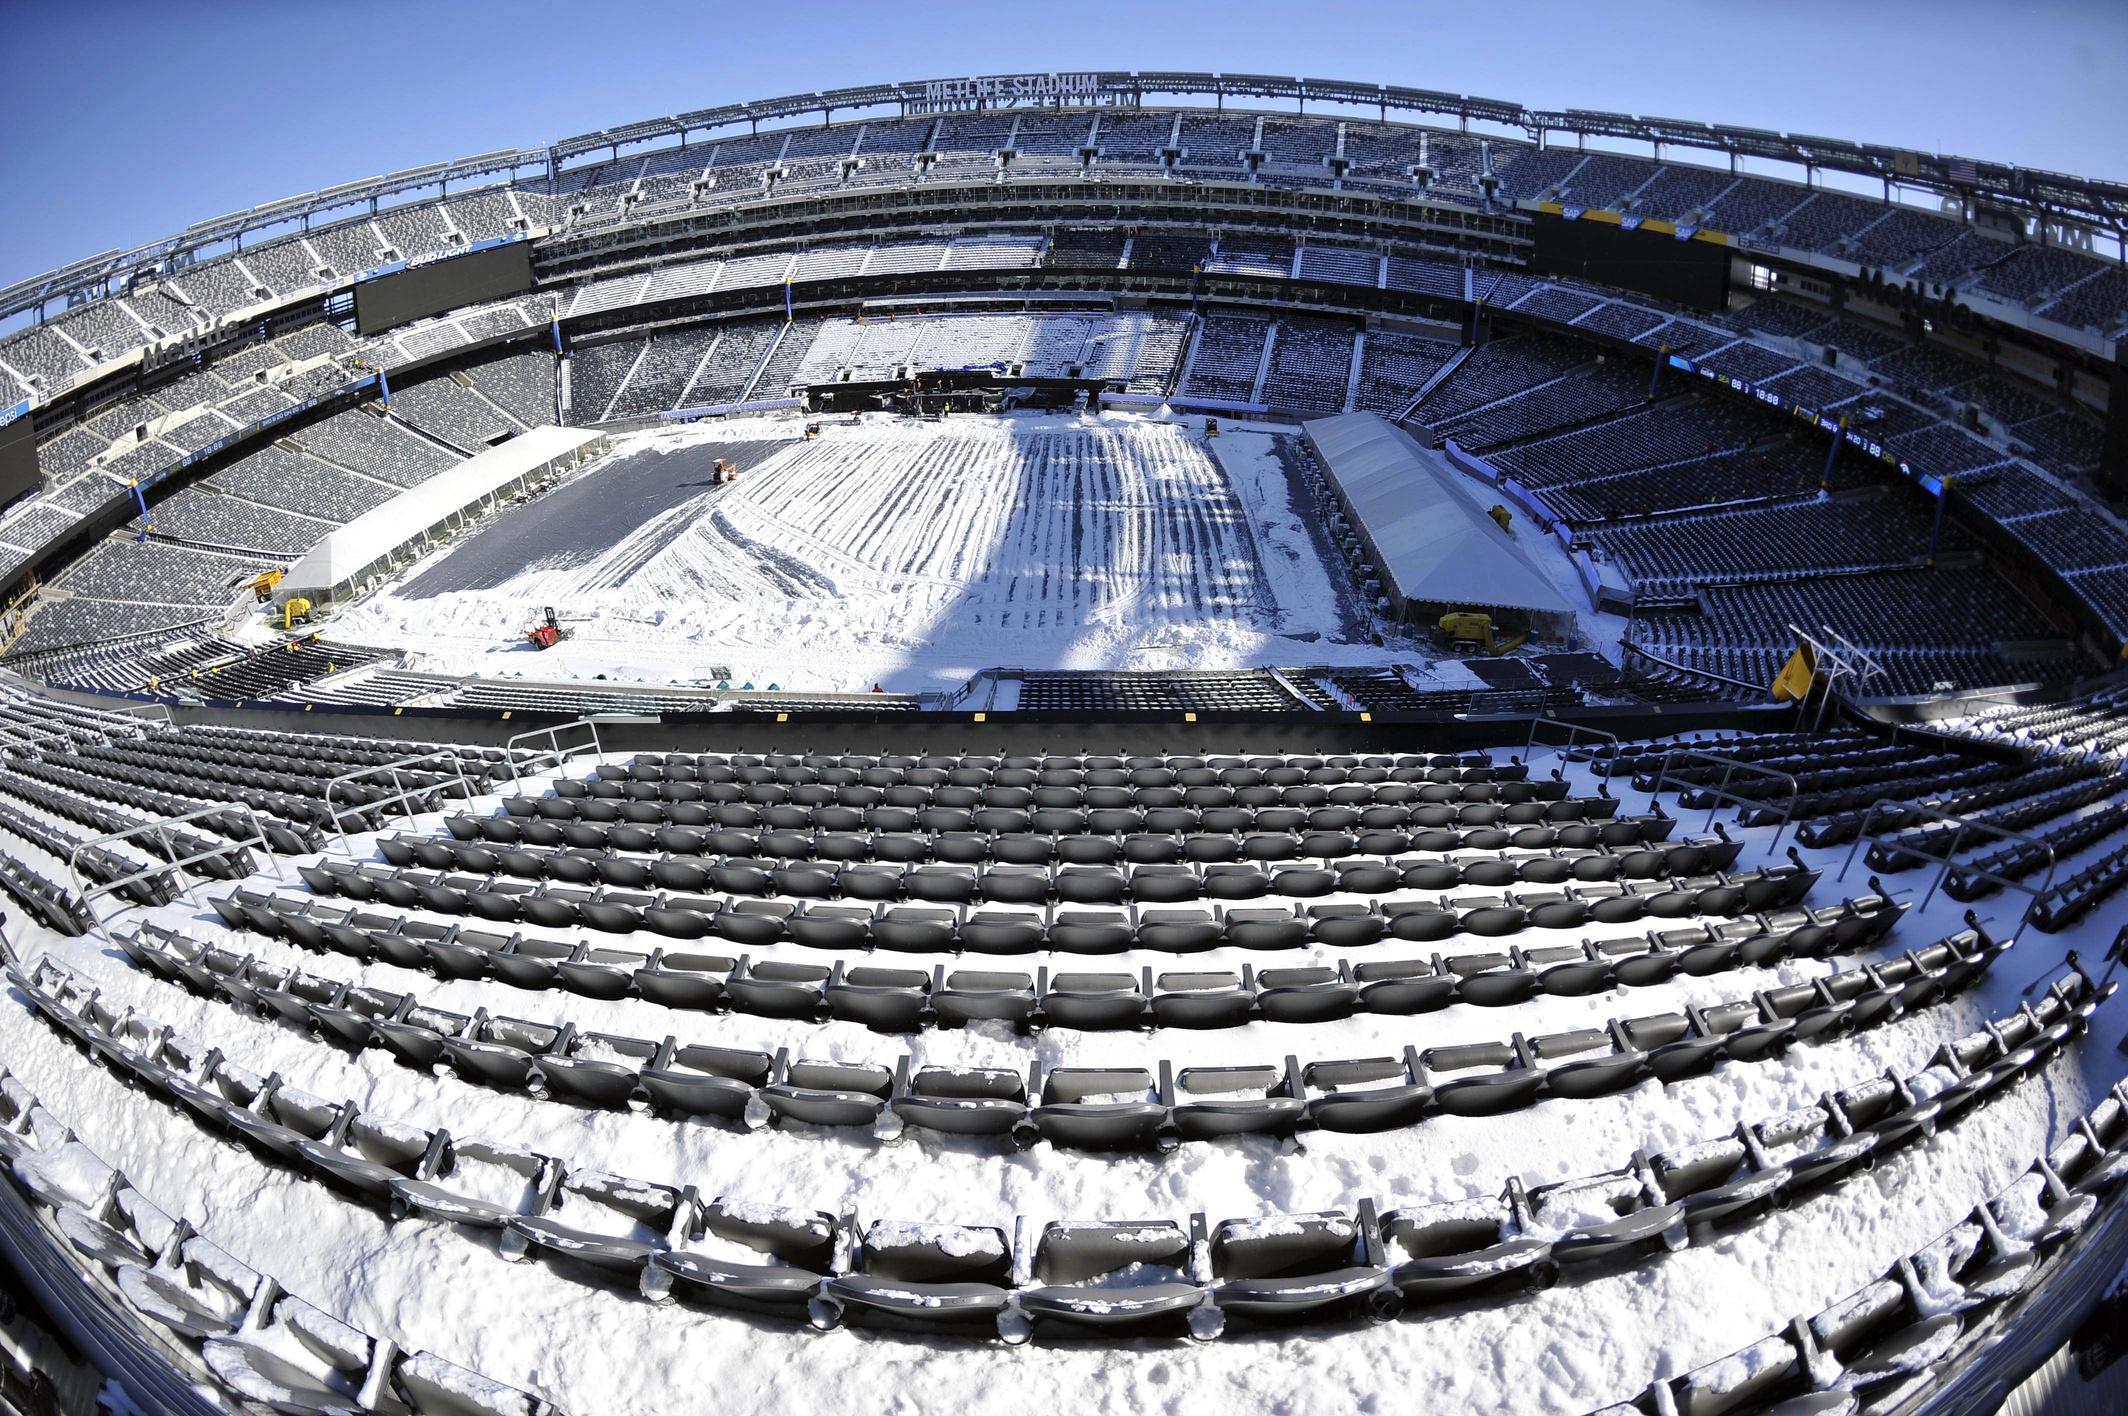 Super Bowl Fantasy Location